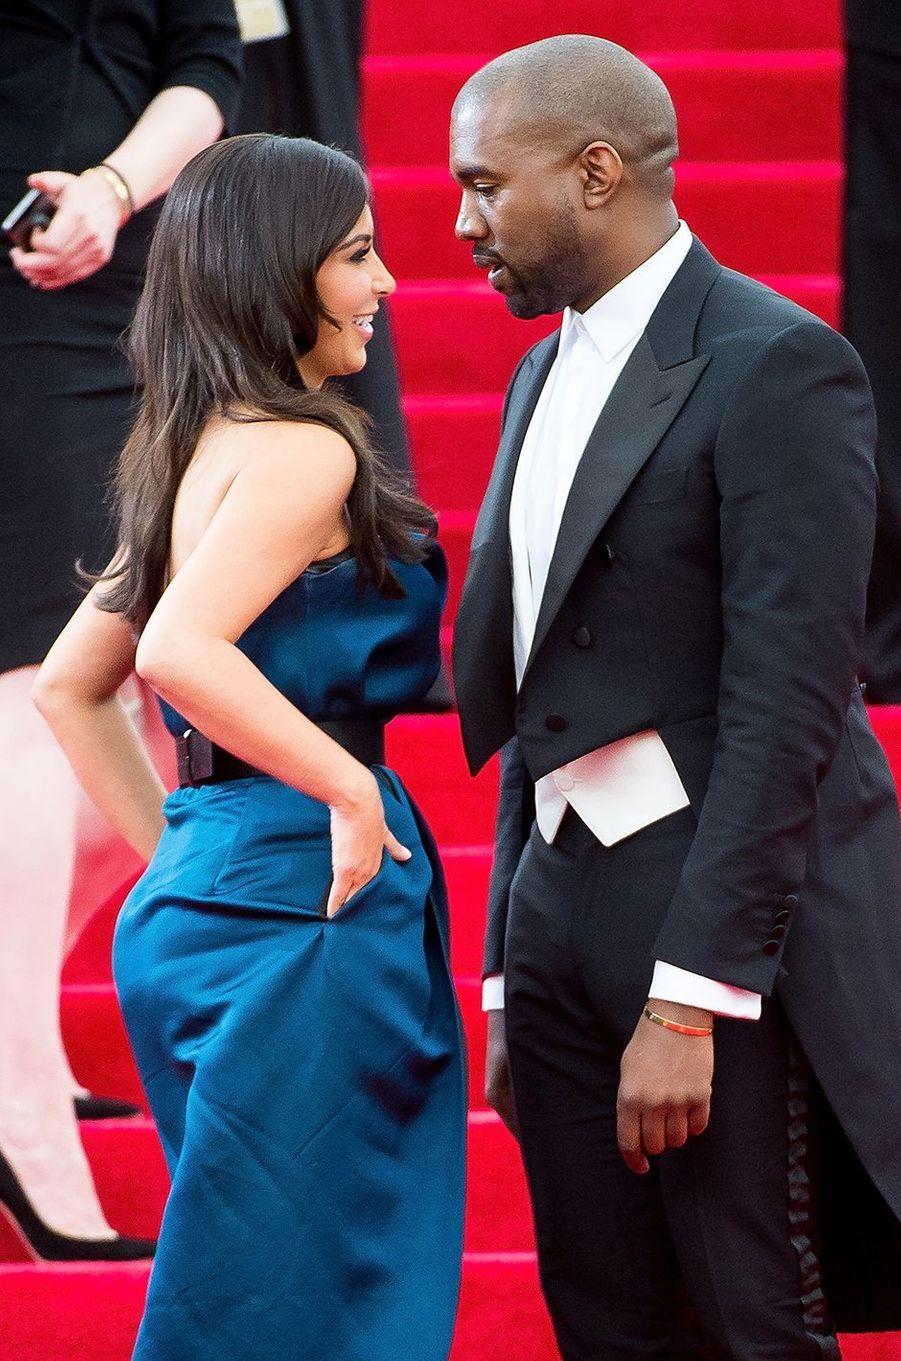 Kim Kardashian et Kanye West au gala du MET à New York en mai 2014